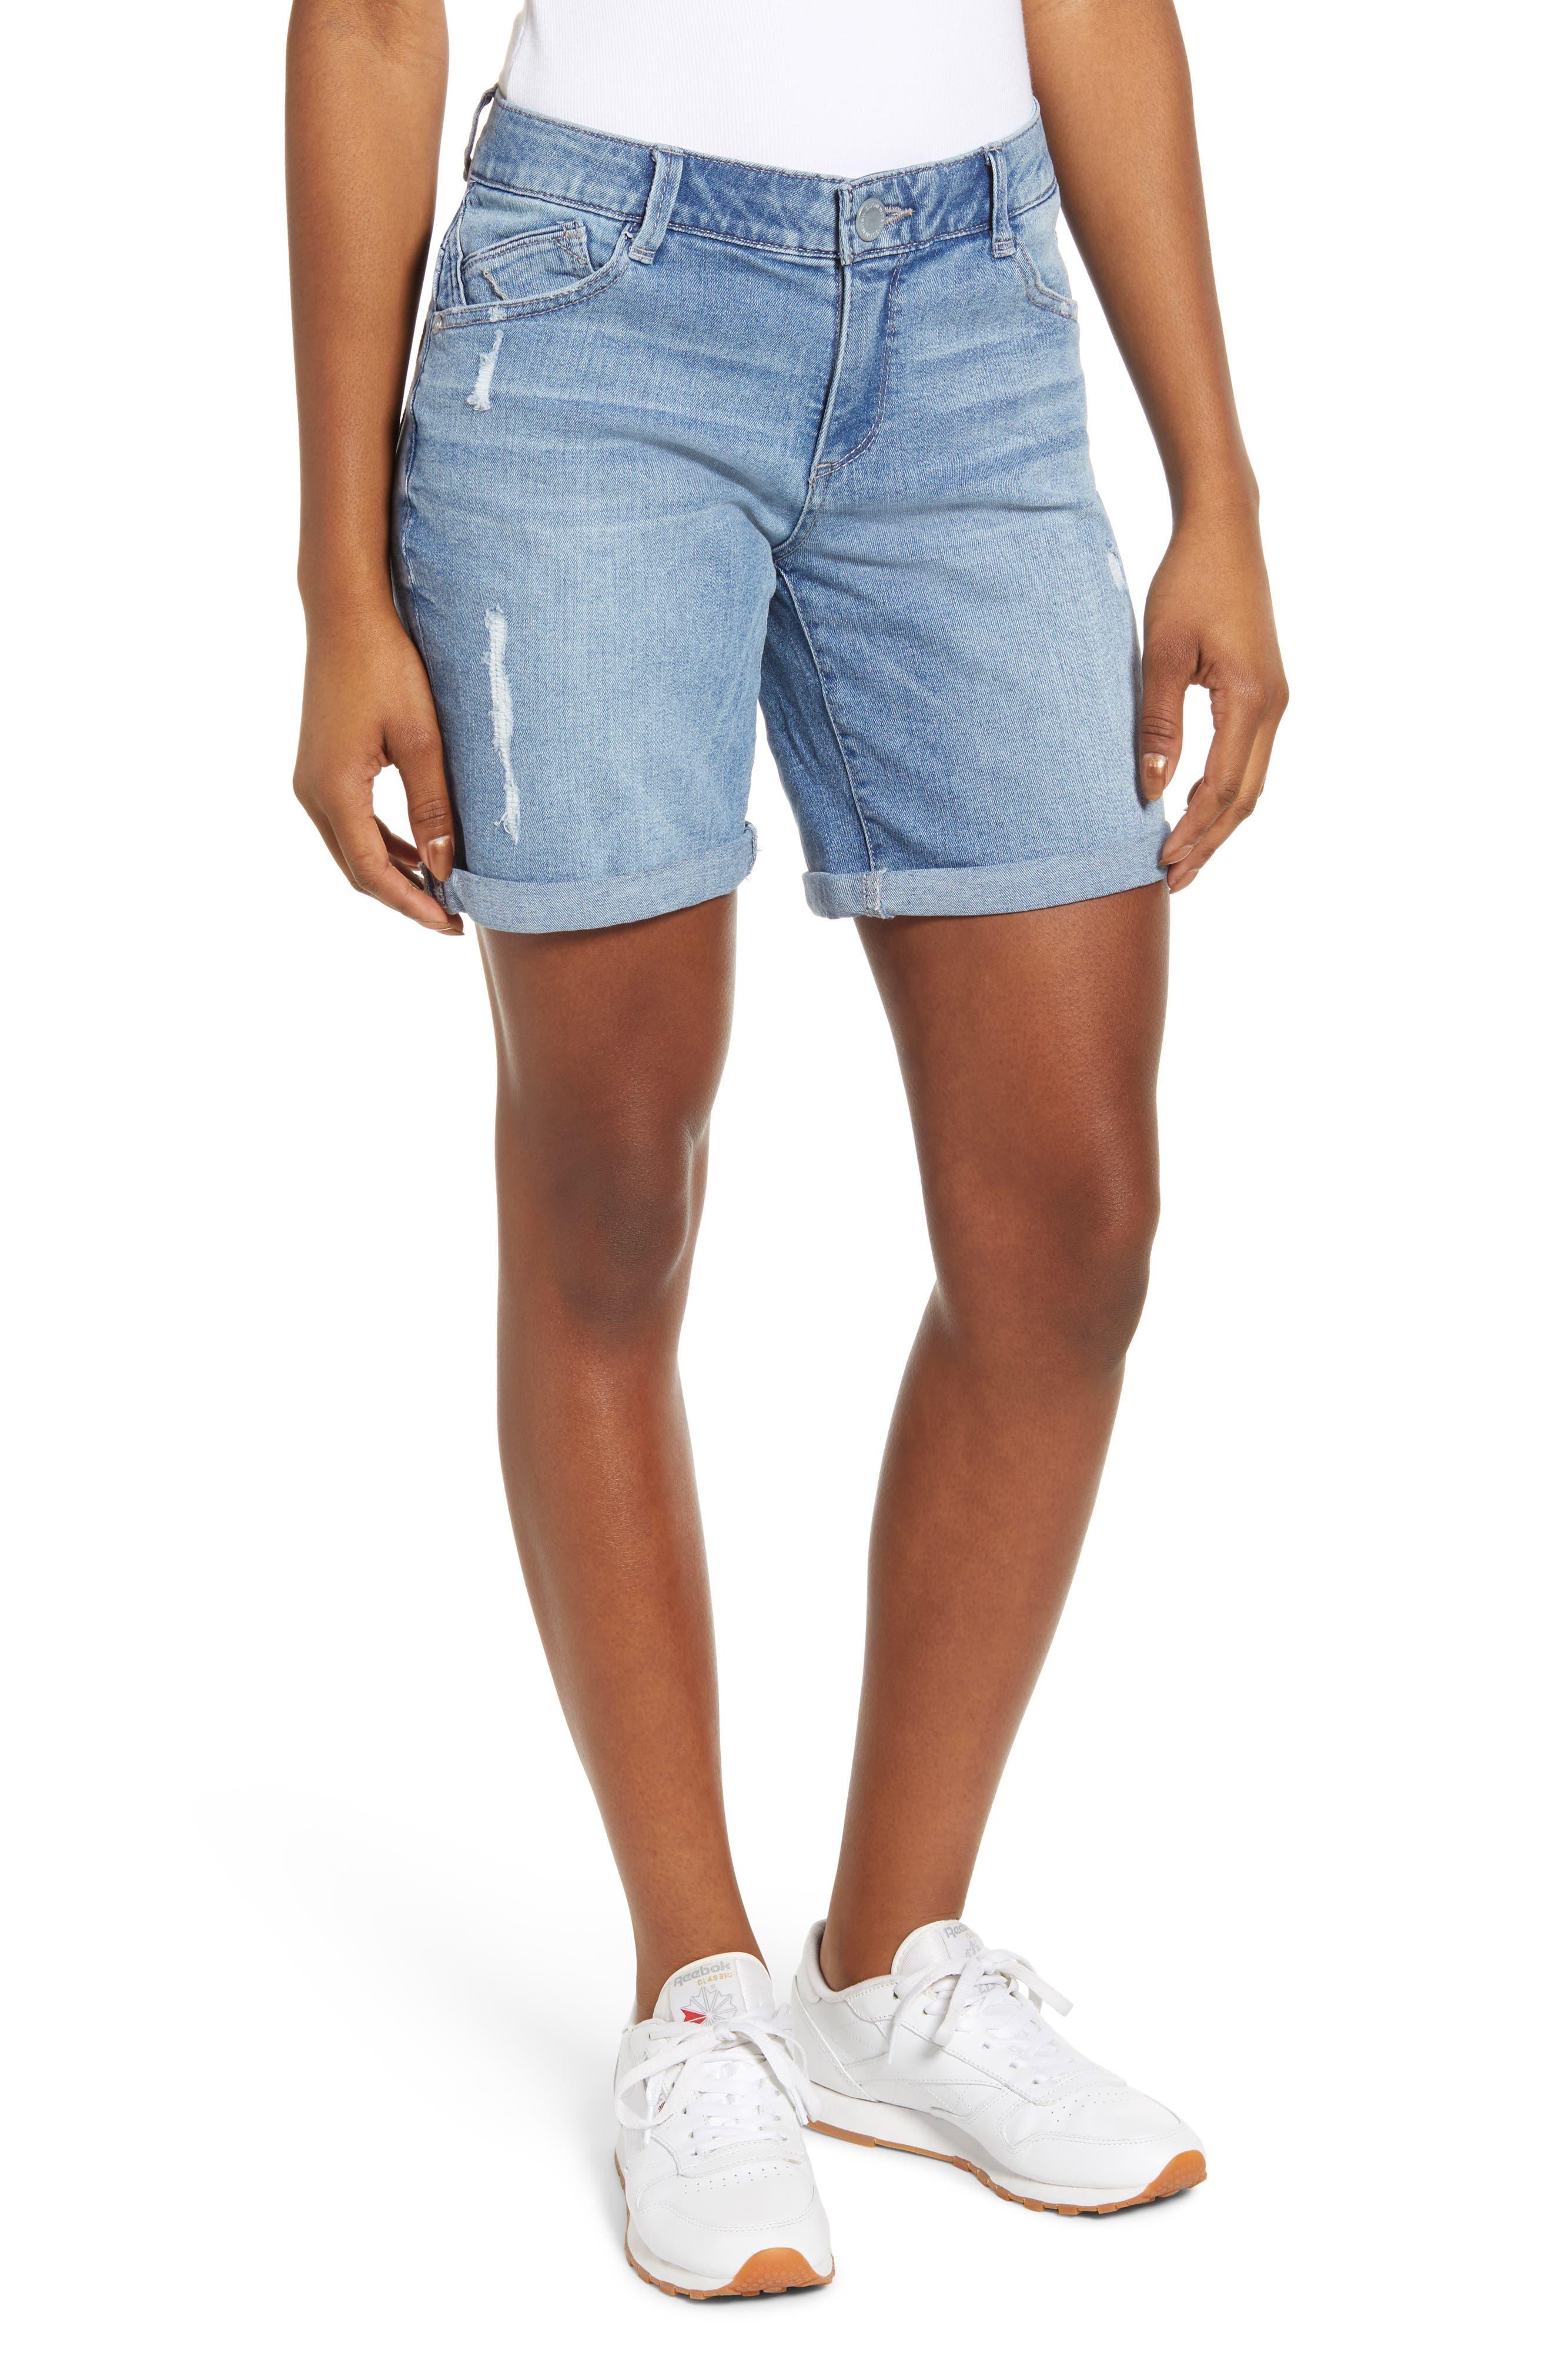 Women's Wit & Wisdom Ab-Solution Denim Bermuda Shorts